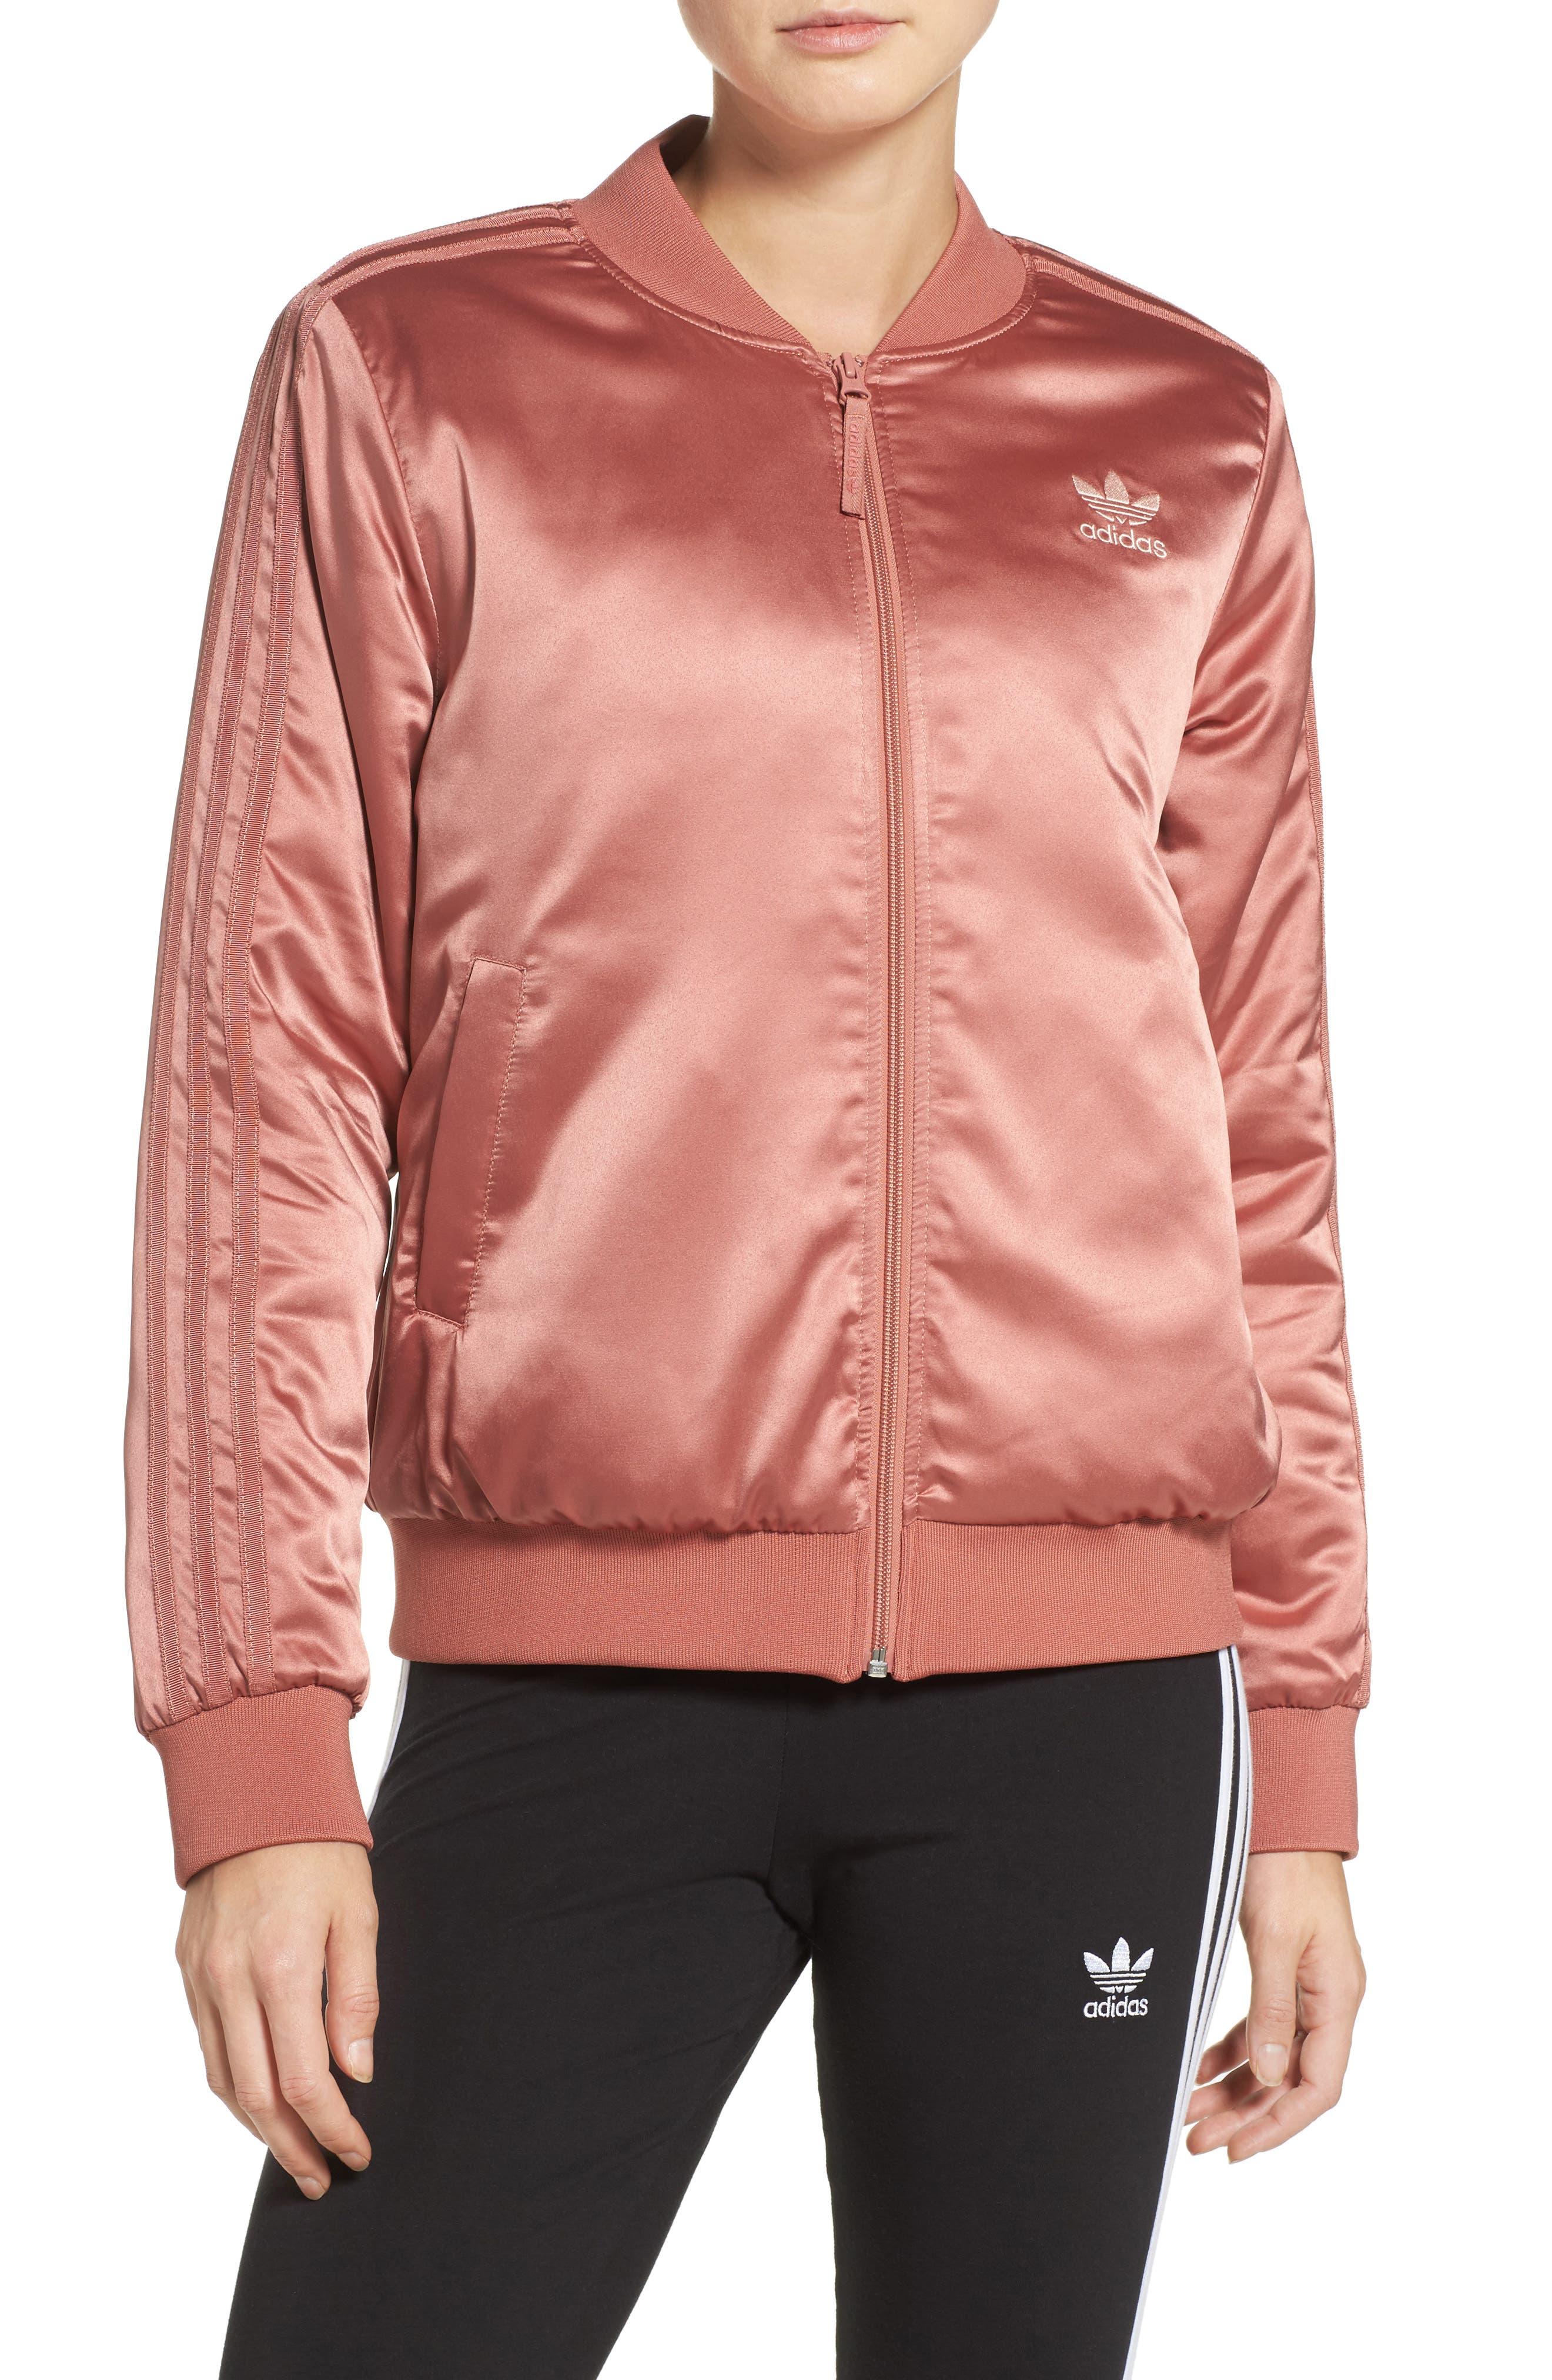 Alternate Image 1 Selected - adidas Originals Trefoil Satin Jacket